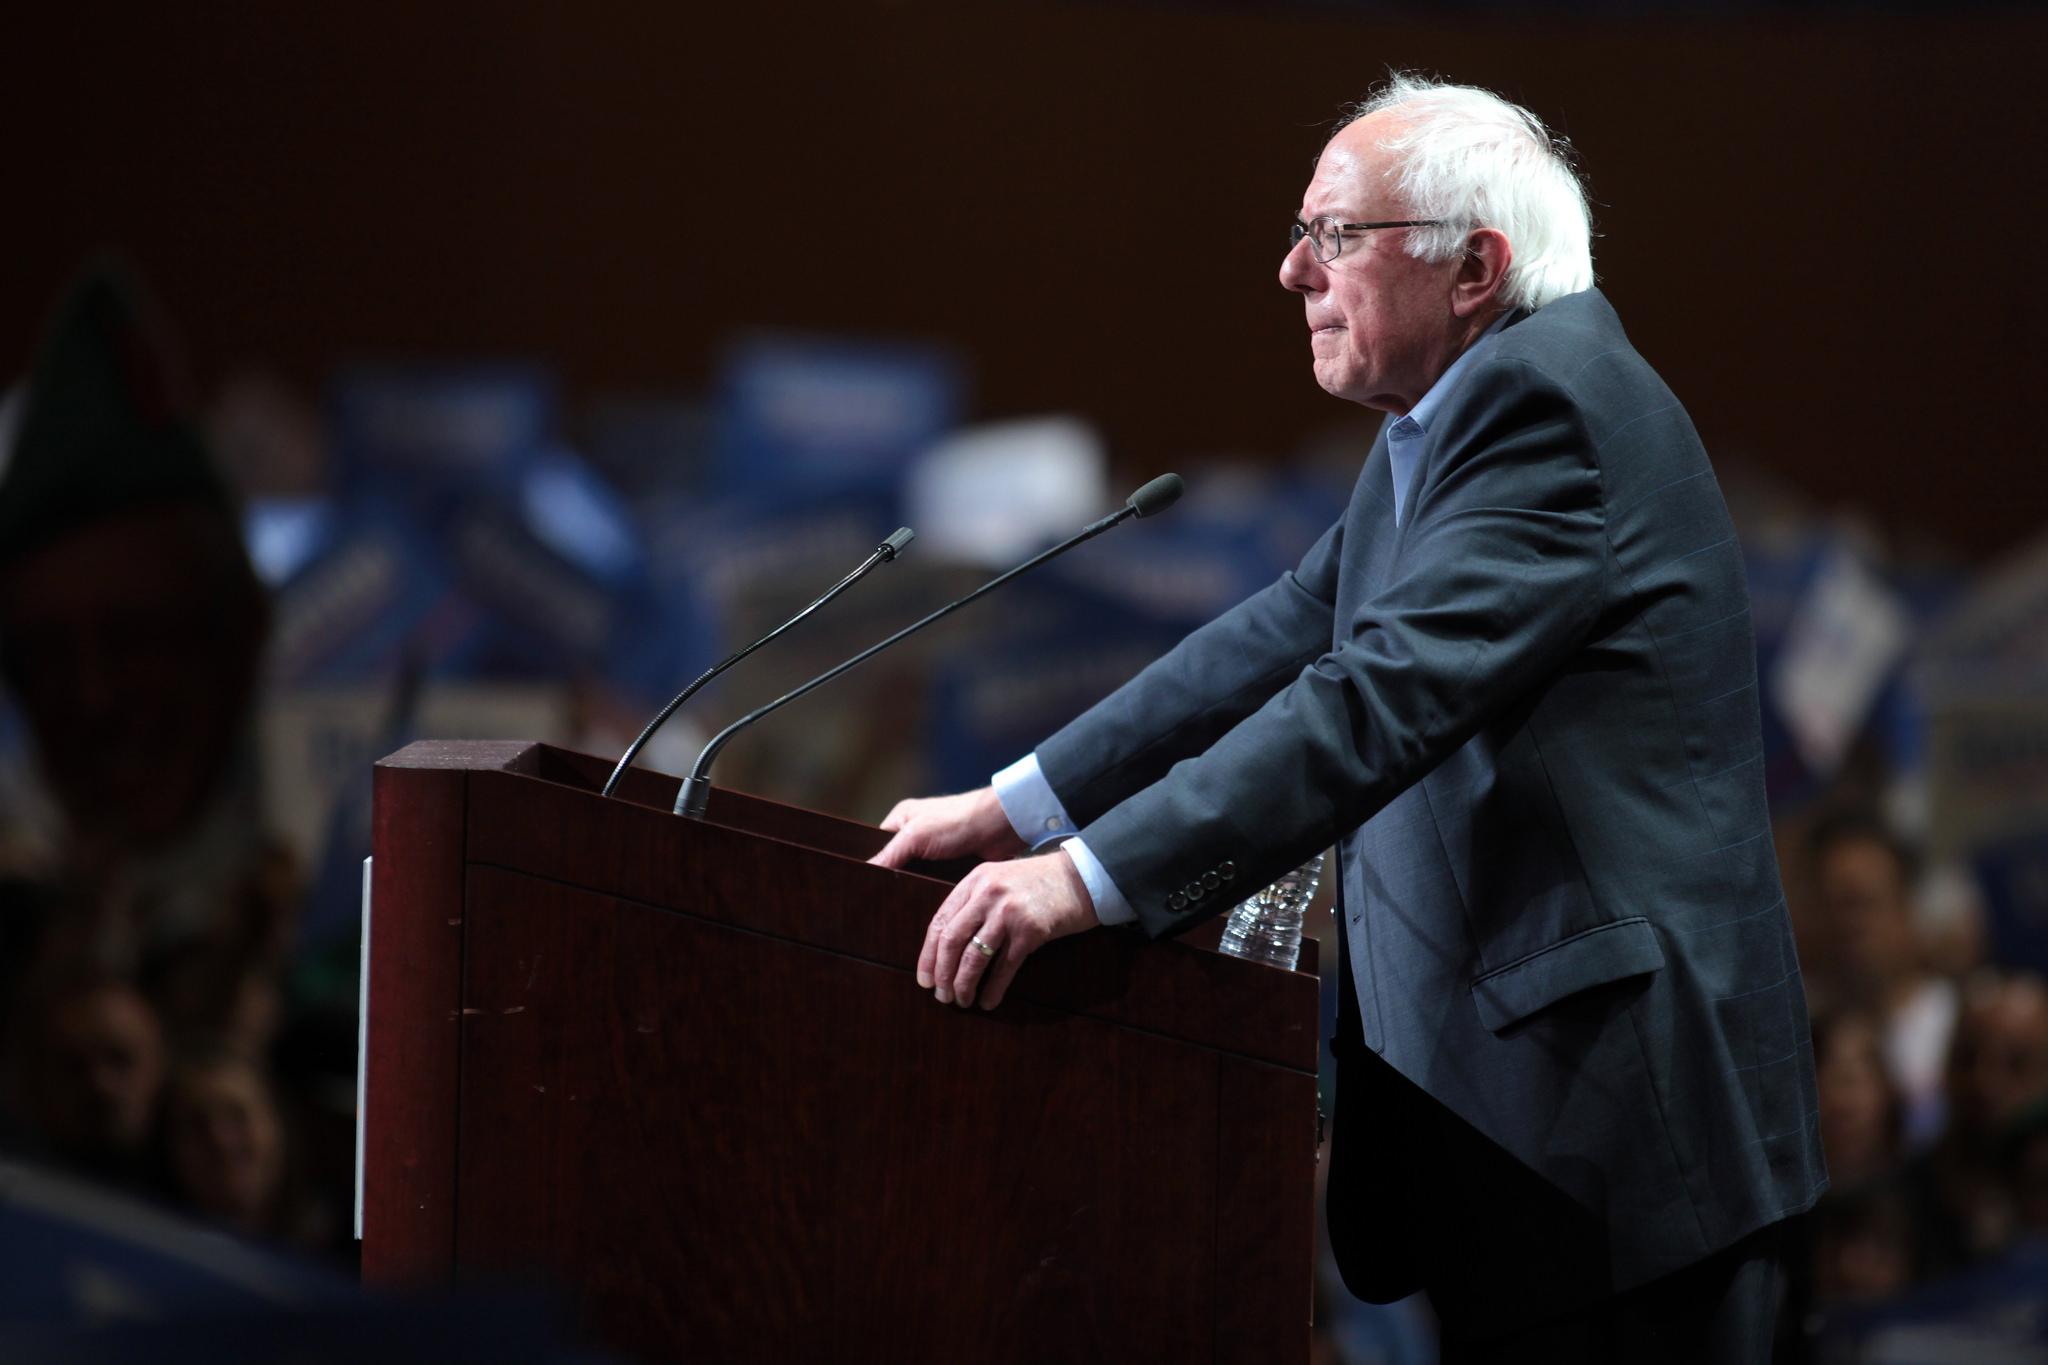 Bernie Sanders, Democratic senator from Vermont and presidential candidate (Gage Skidmore/Flickr)